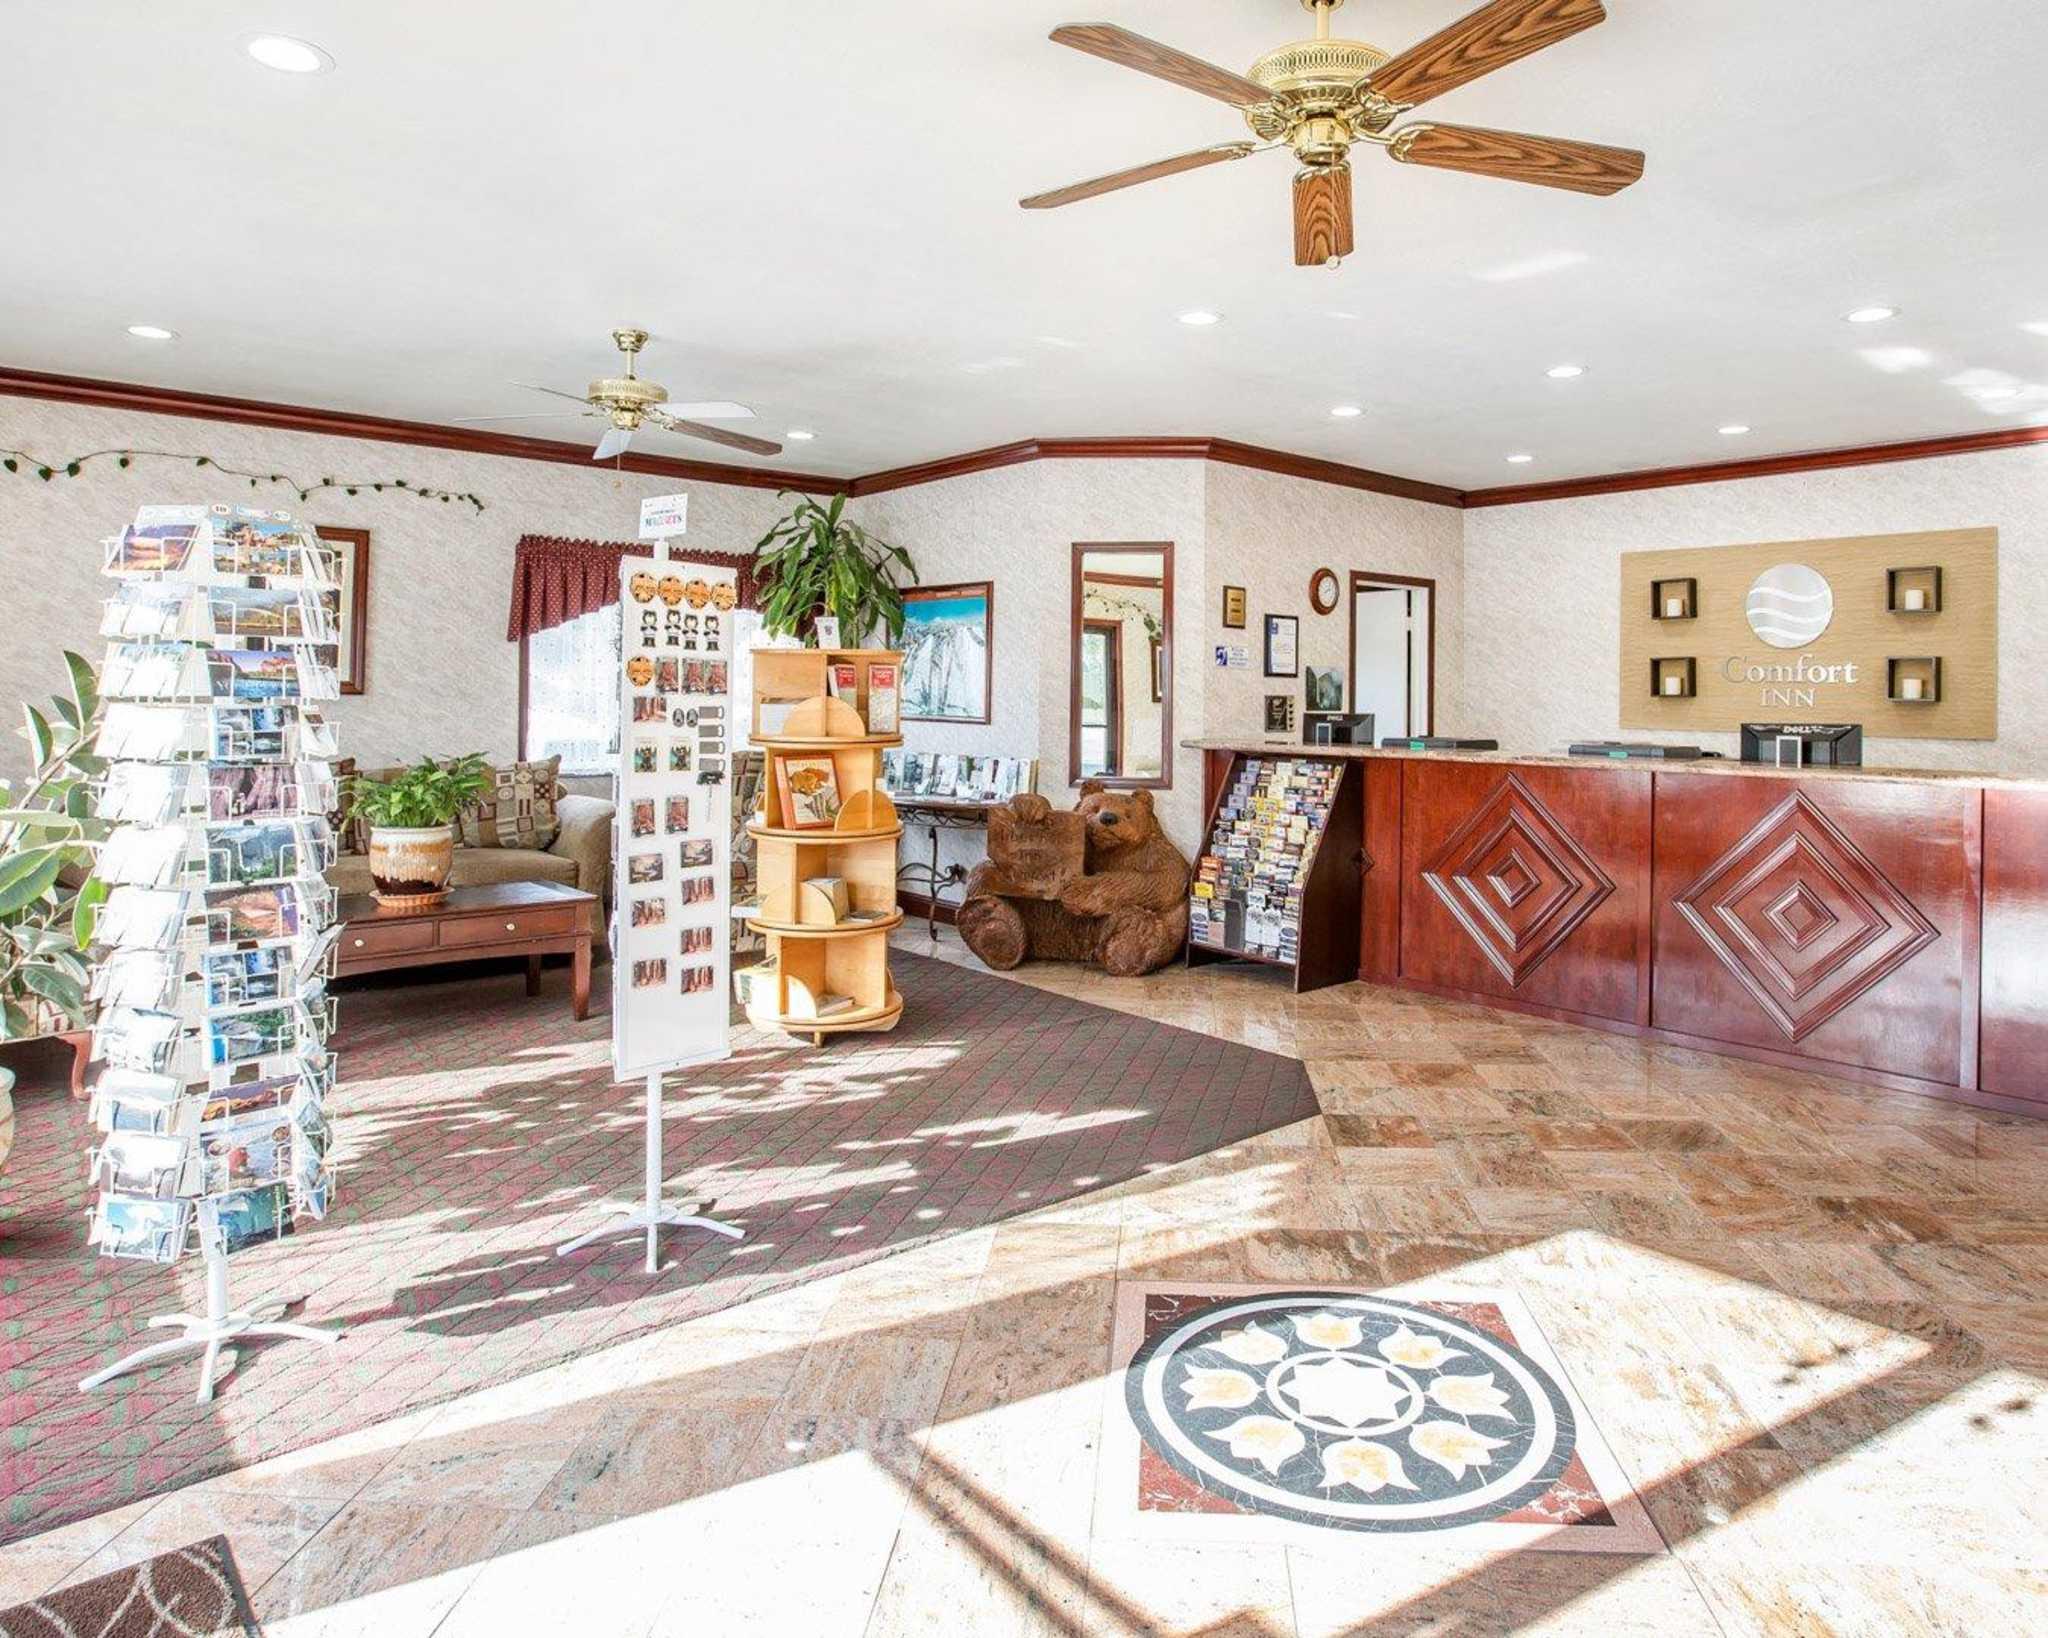 Comfort Inn Yosemite Area - Hotels Oakhurst California | 2048 x 1638 jpeg 319kB